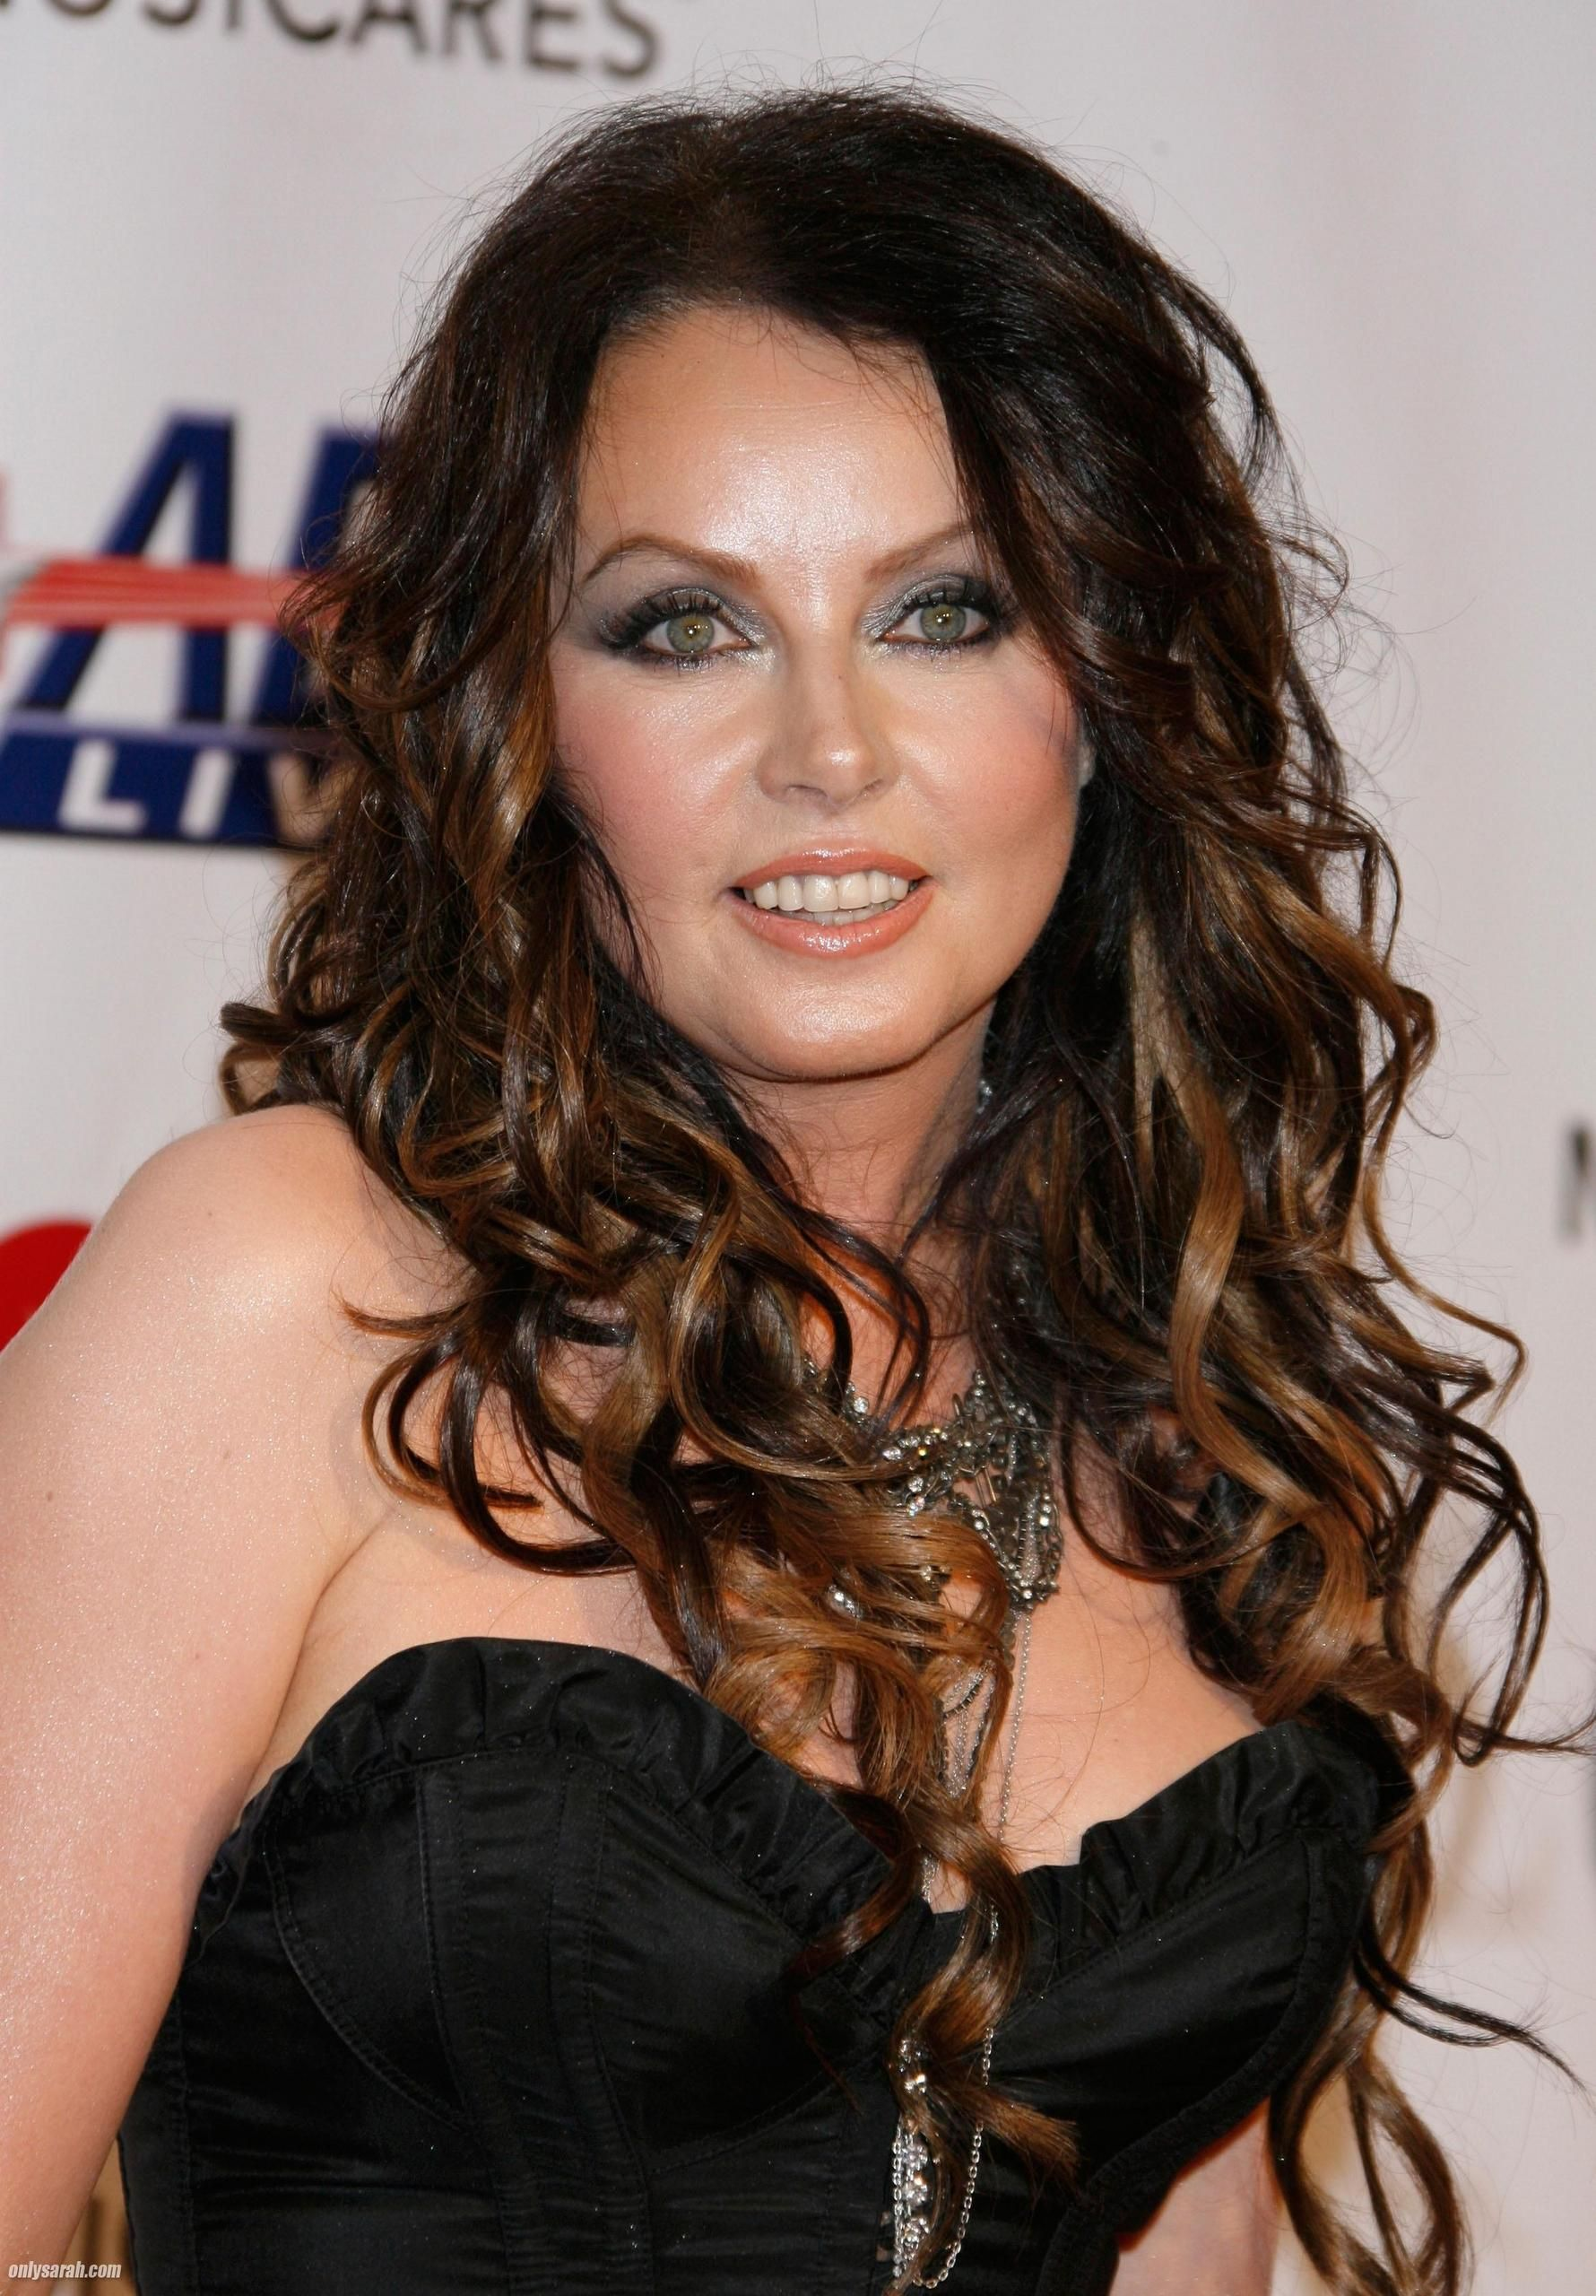 Khloe kardashian nude leak